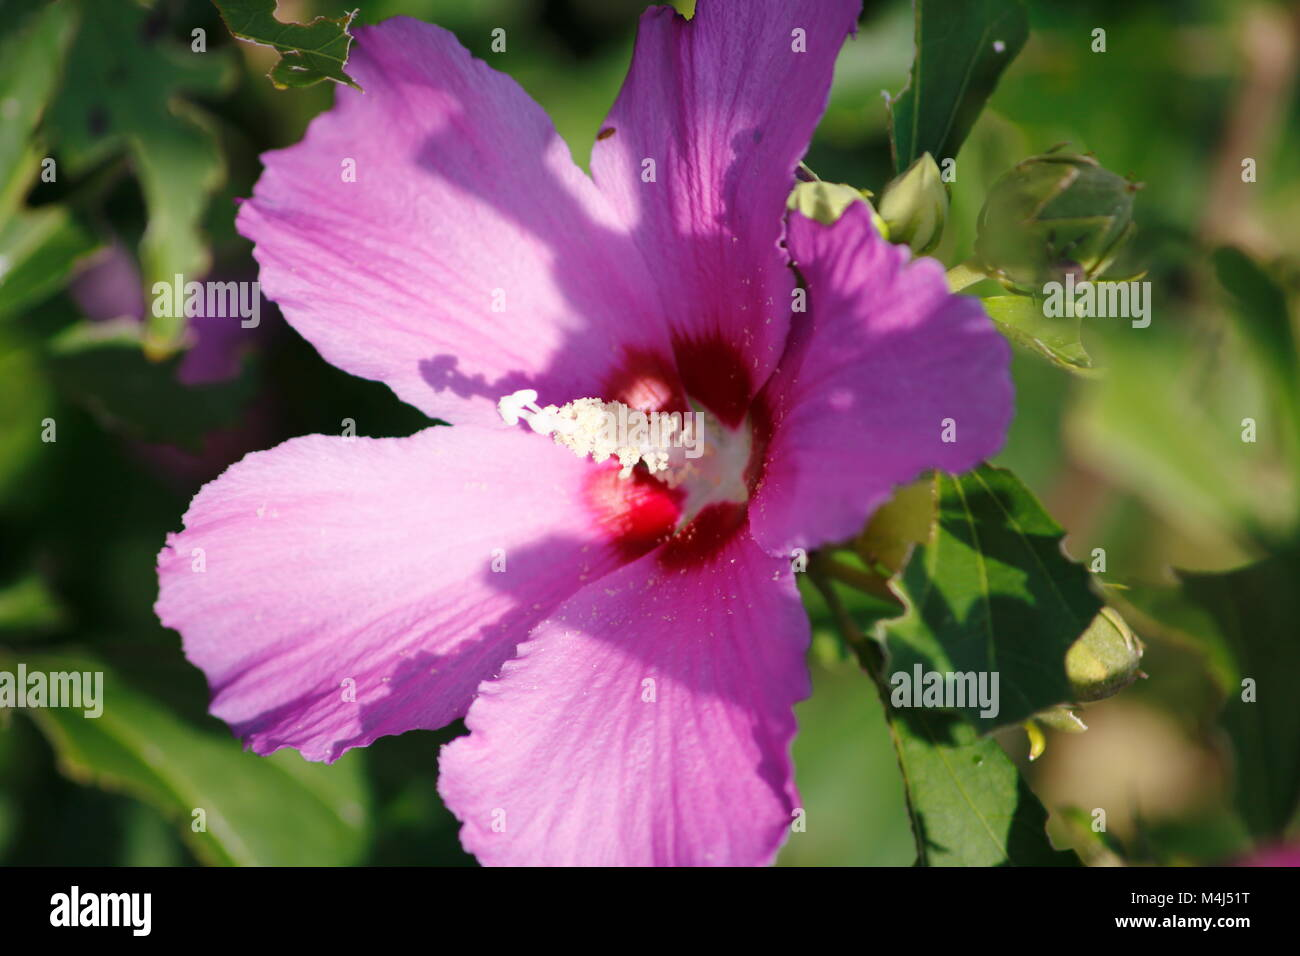 Pink farbene, rosa Hibiskus Blüte im Detail am Hibiskus Strauch - Stock Image